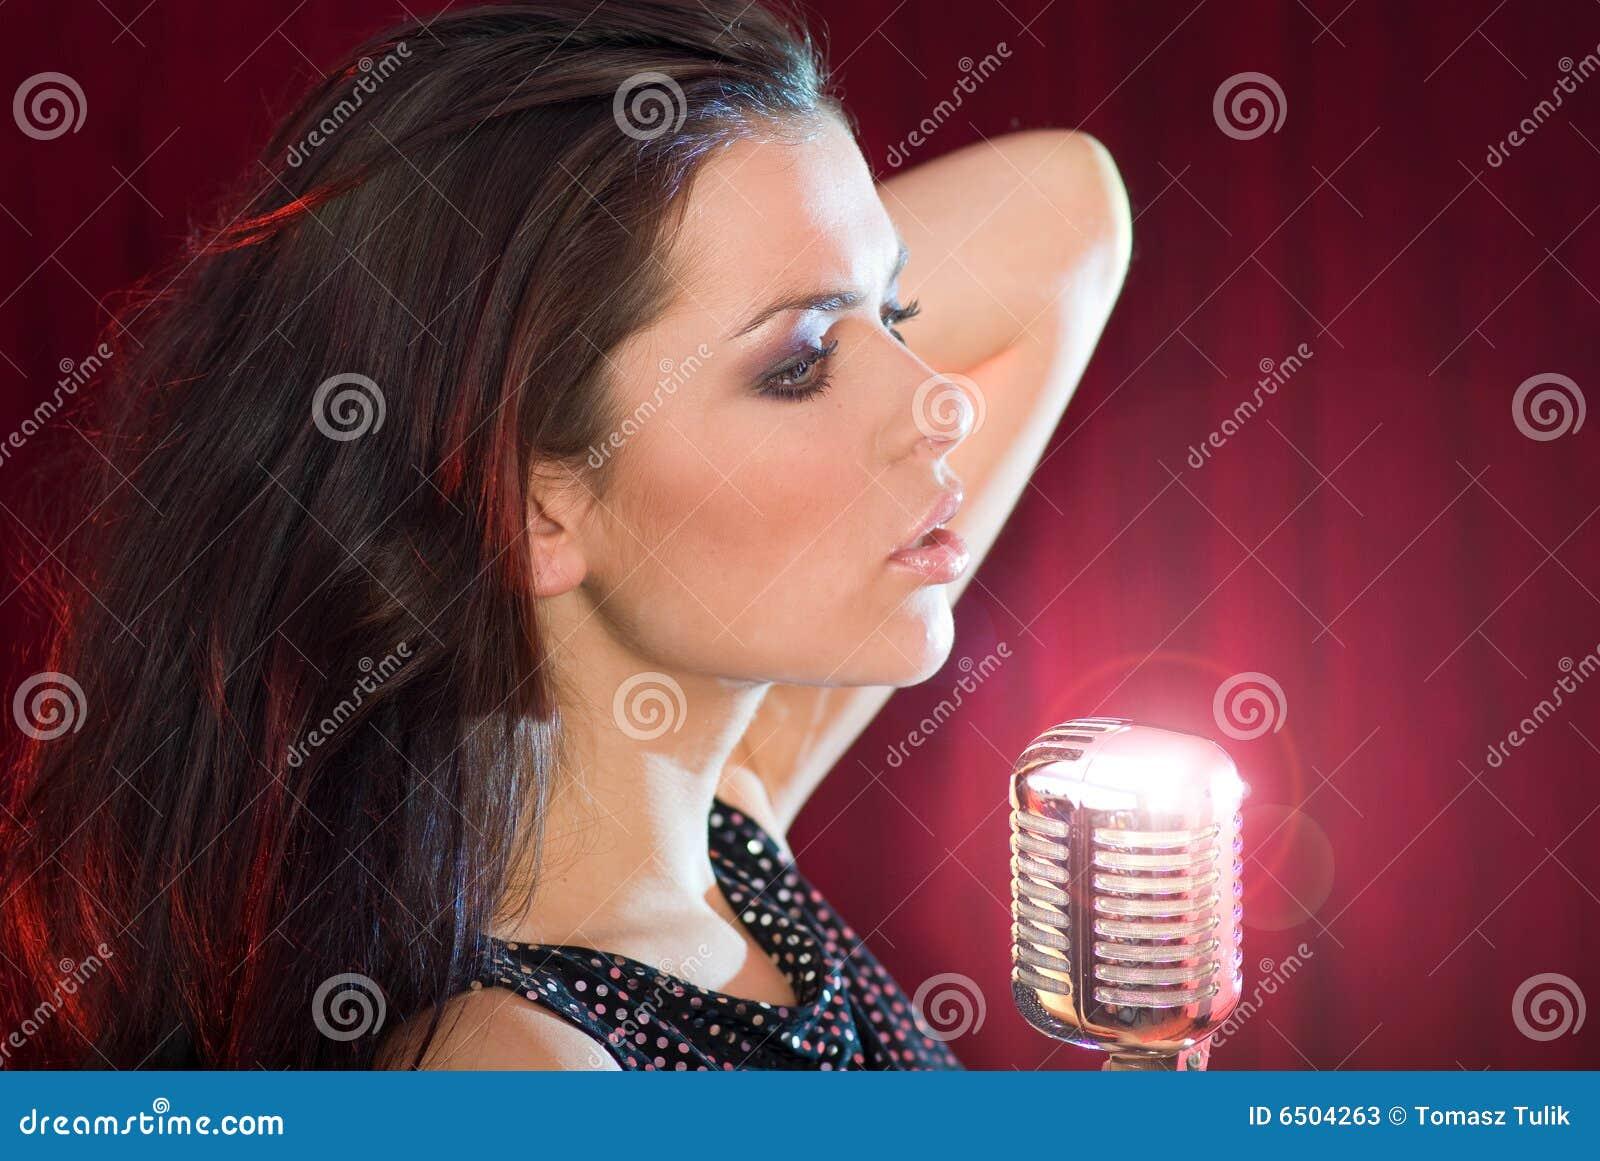 singing the girl retro - photo #4